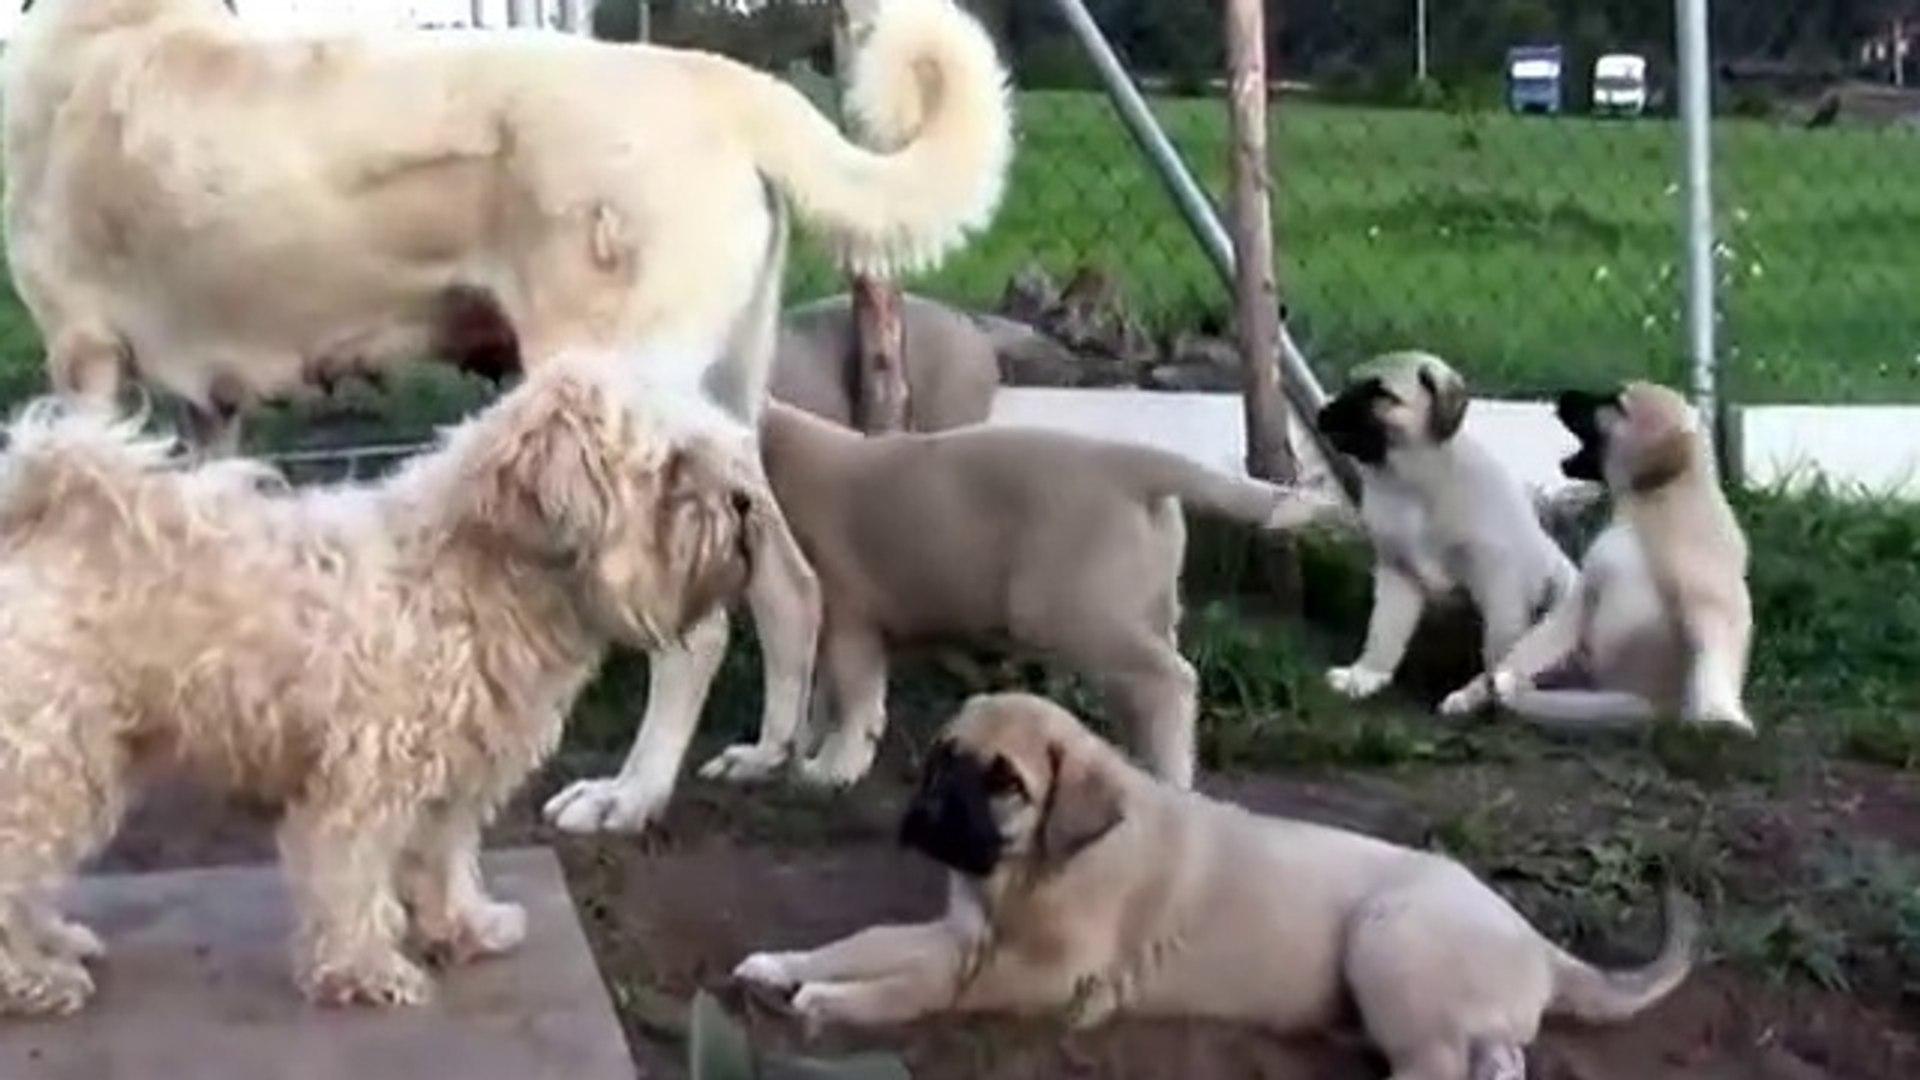 SEViMLi COBAN KOPEGi AiLESi - CUTE ANATOLiAN SHEPHERD DOG FAMiLY